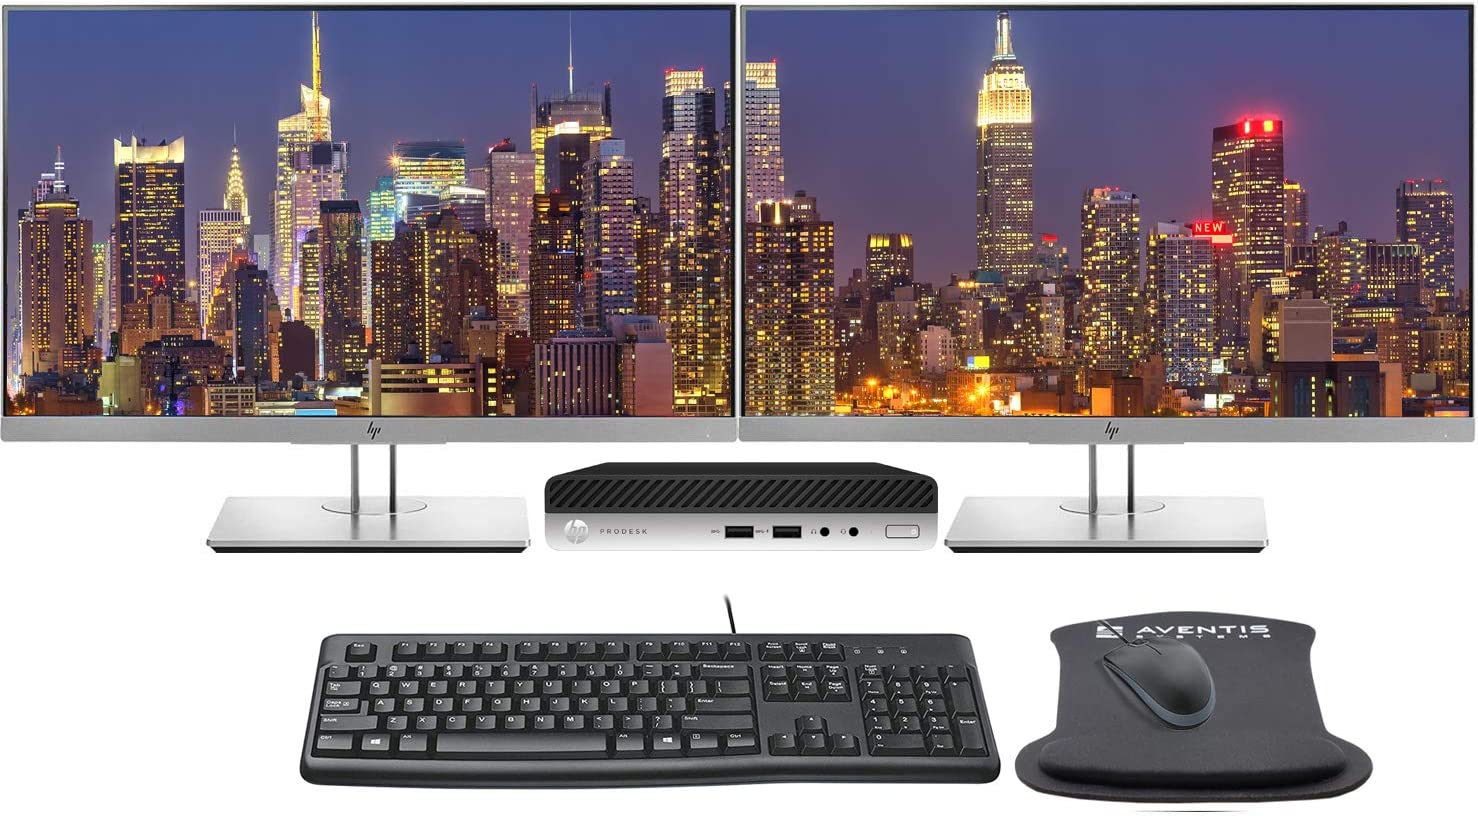 "HP ProDesk 400 G5 Desktop Mini PC Bundle with Dual (2) 24"" FHD HP E243 Monitors, Keyboard, Mouse, WiFi, Intel Core i5-9500T, 16GB, 500GB NVME SSD, Windows 10 Professional"